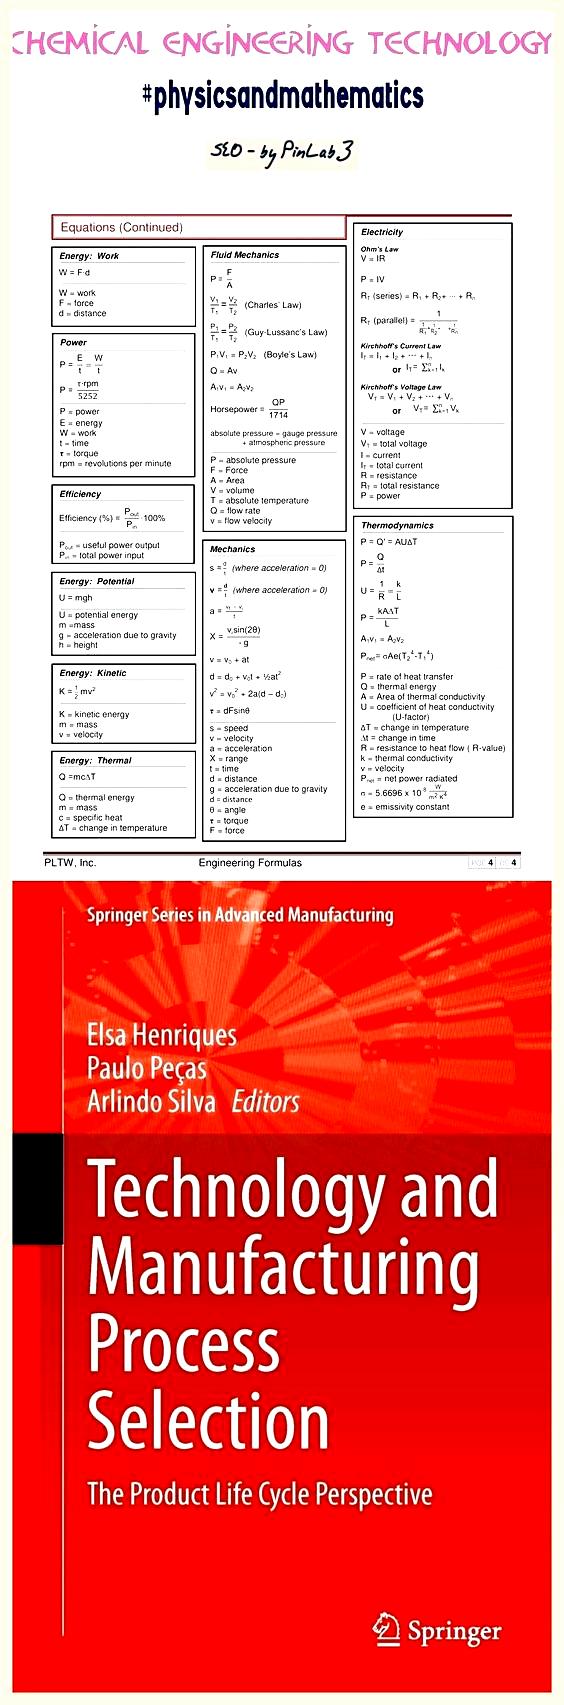 Photo of Physics and mathematics  #chemical #engineer #outfit chemical engineer outfit, c…